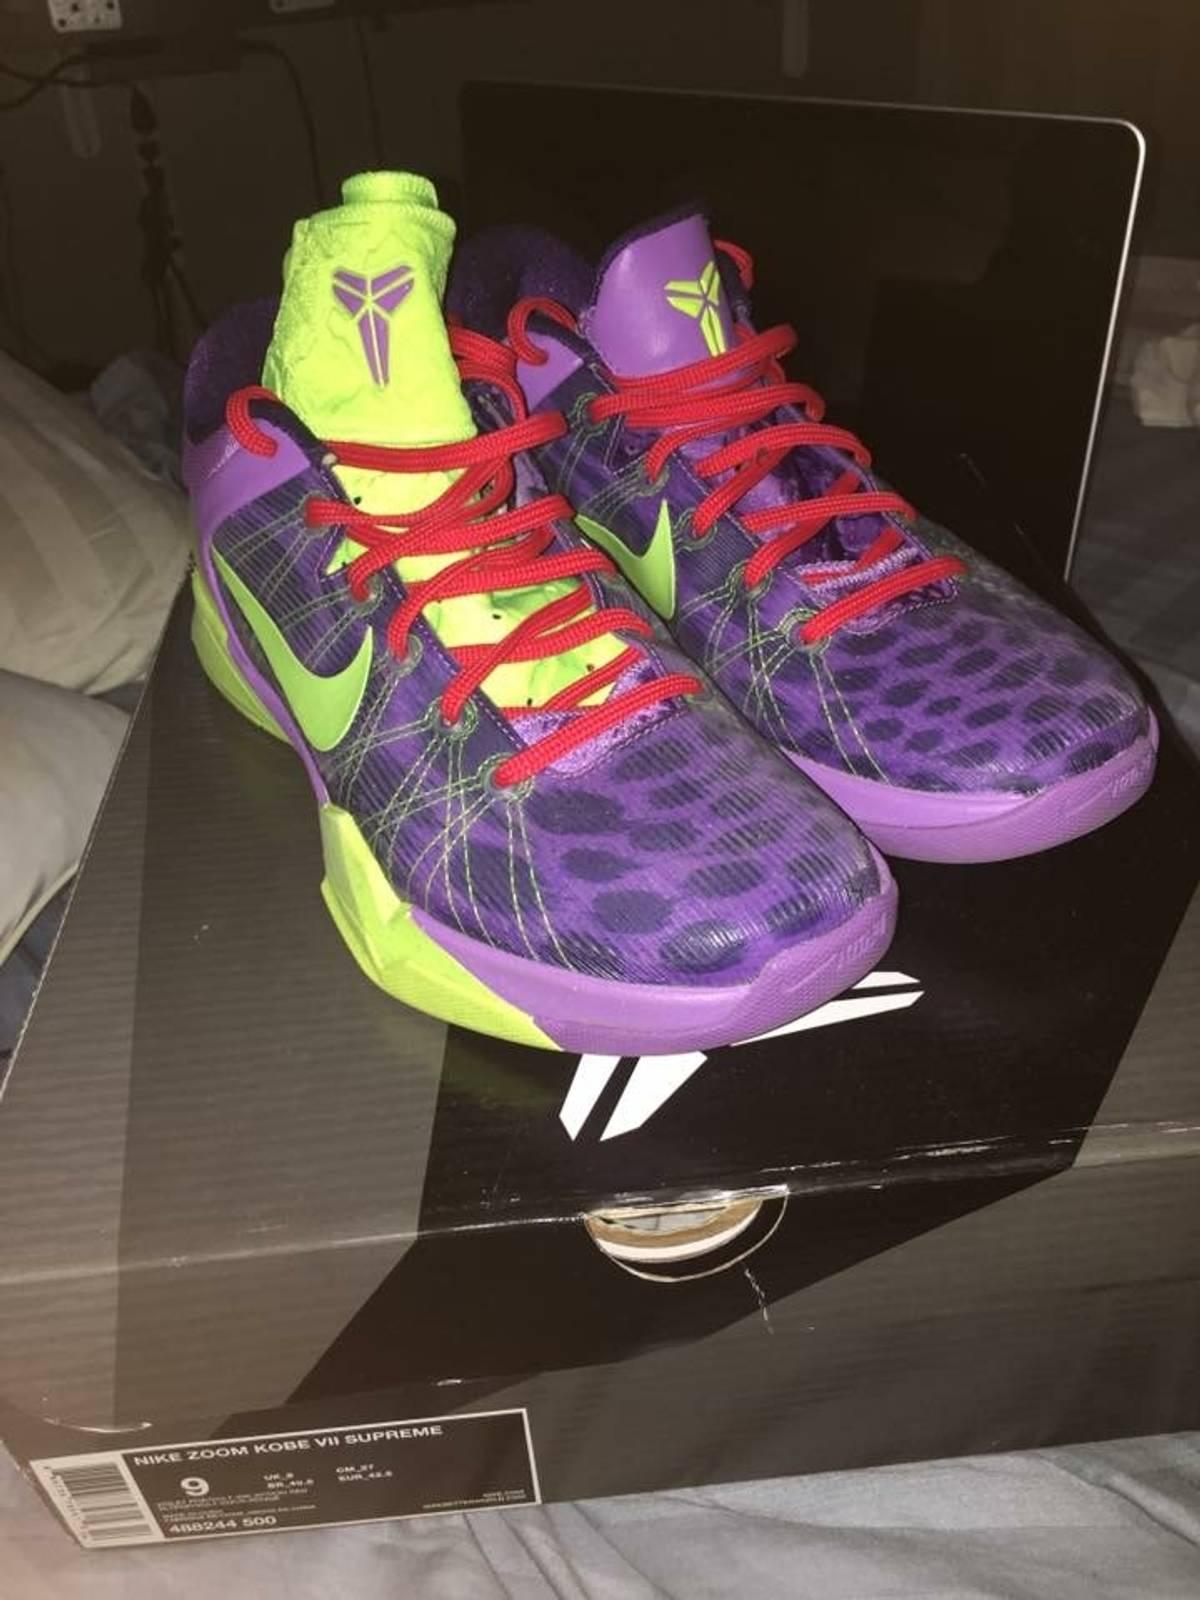 56f271552987 Nike Nike Kobe 7 Christmas Xmas Cheetah Grinch Size 9 - for Sale ...